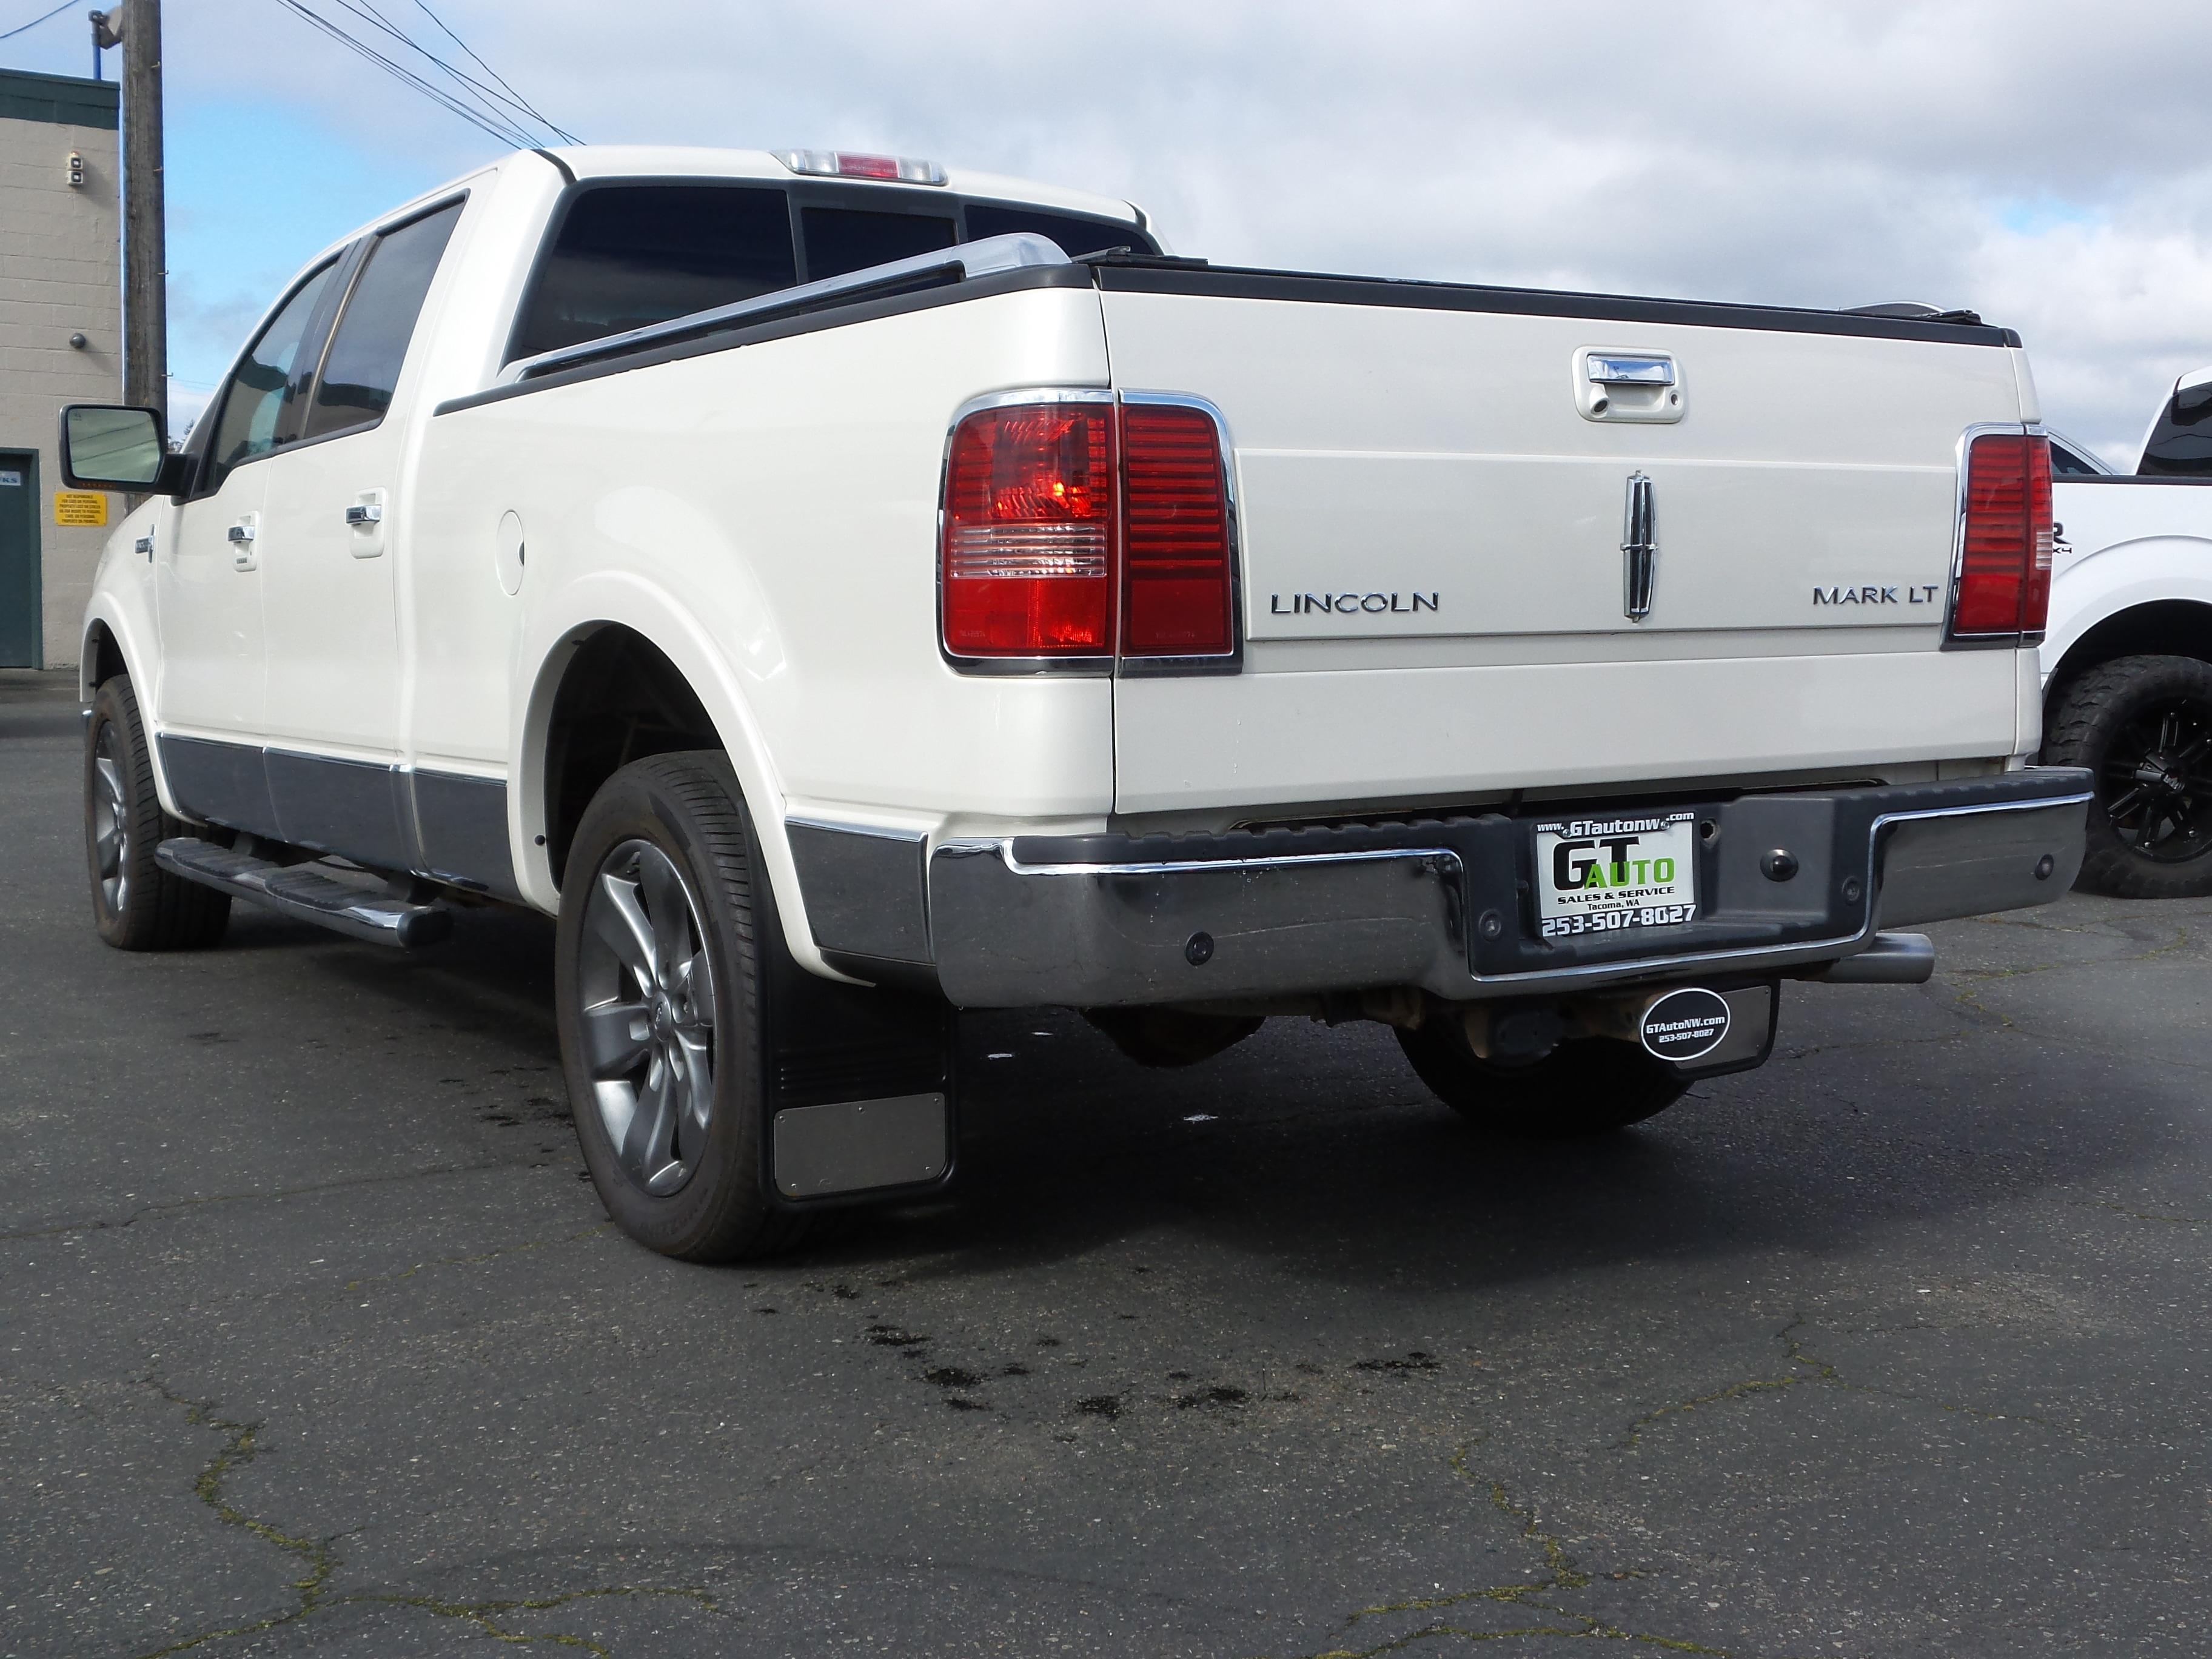 qvyvqhohqnrdxsg mark lt truck used lincoln sale for